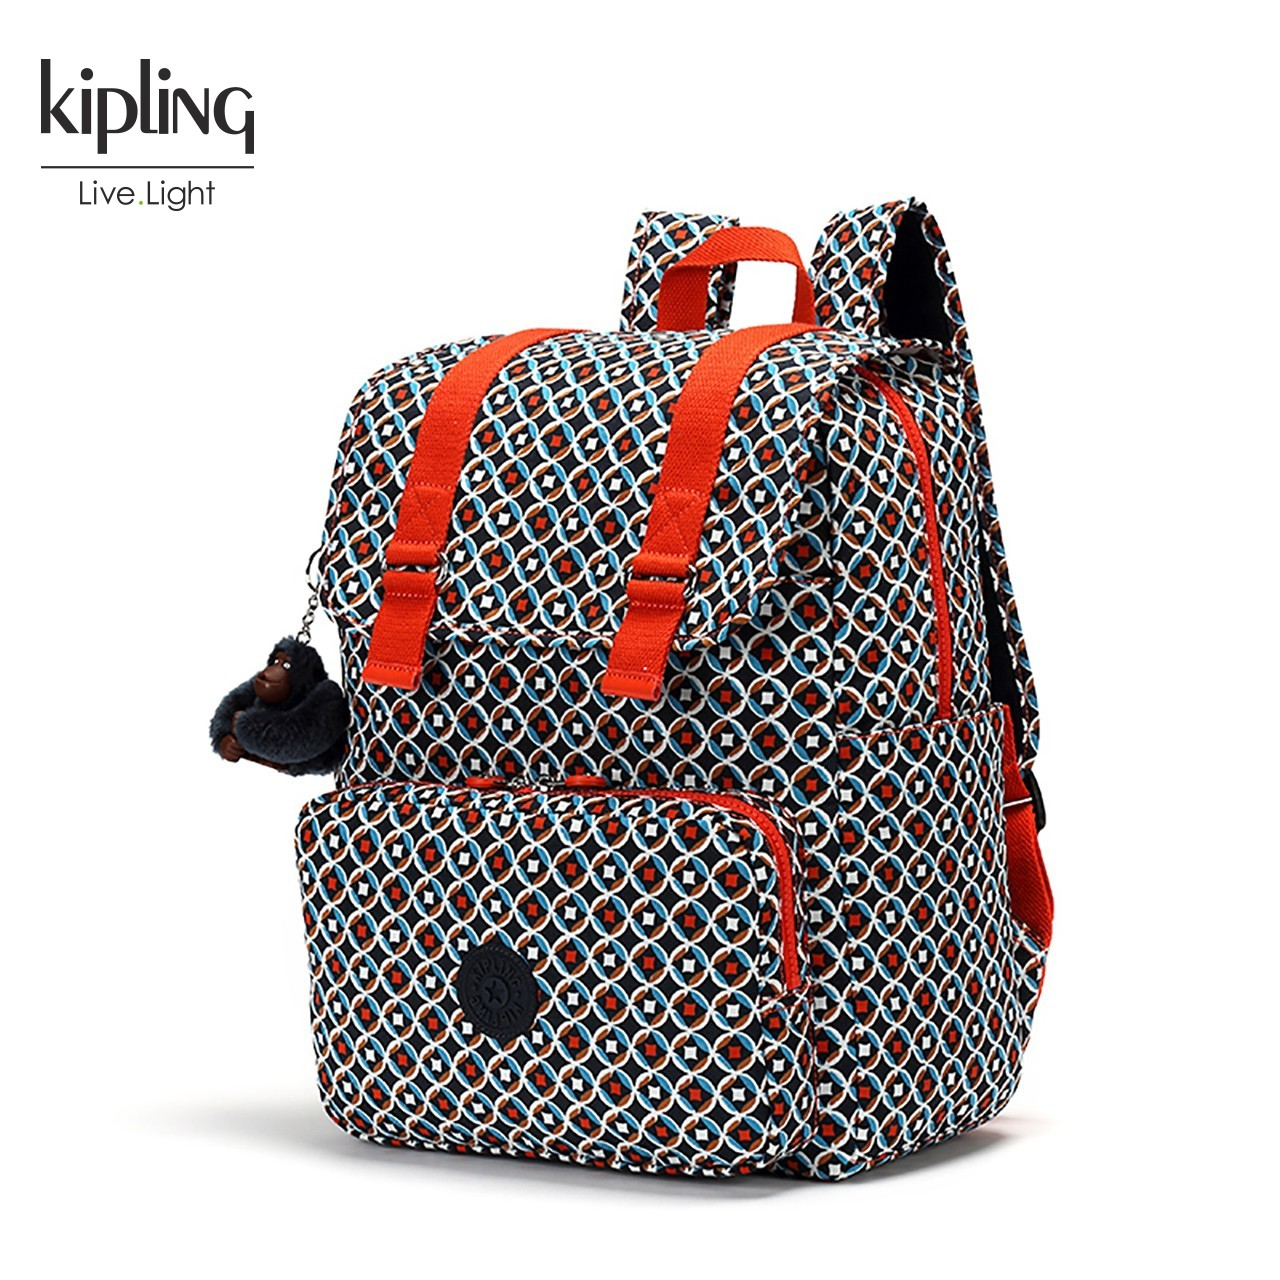 Kipling凯浦林2018新款轻便女包K00935休闲校园双肩包